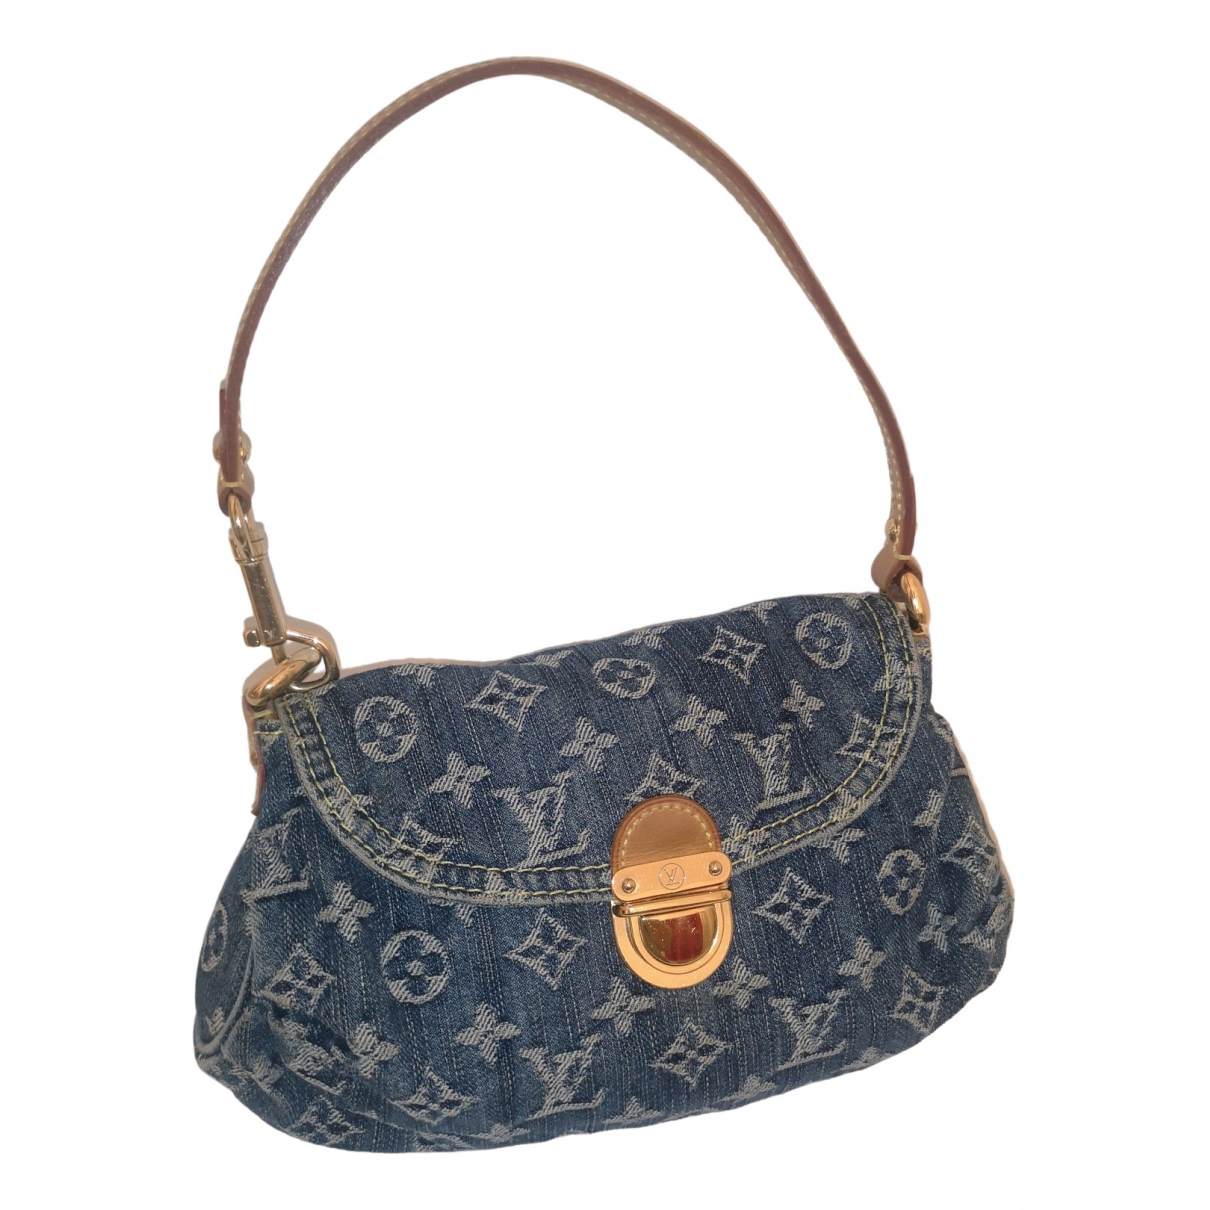 Louis Vuitton Pleaty Blue Denim - Jeans handbag for Women \N